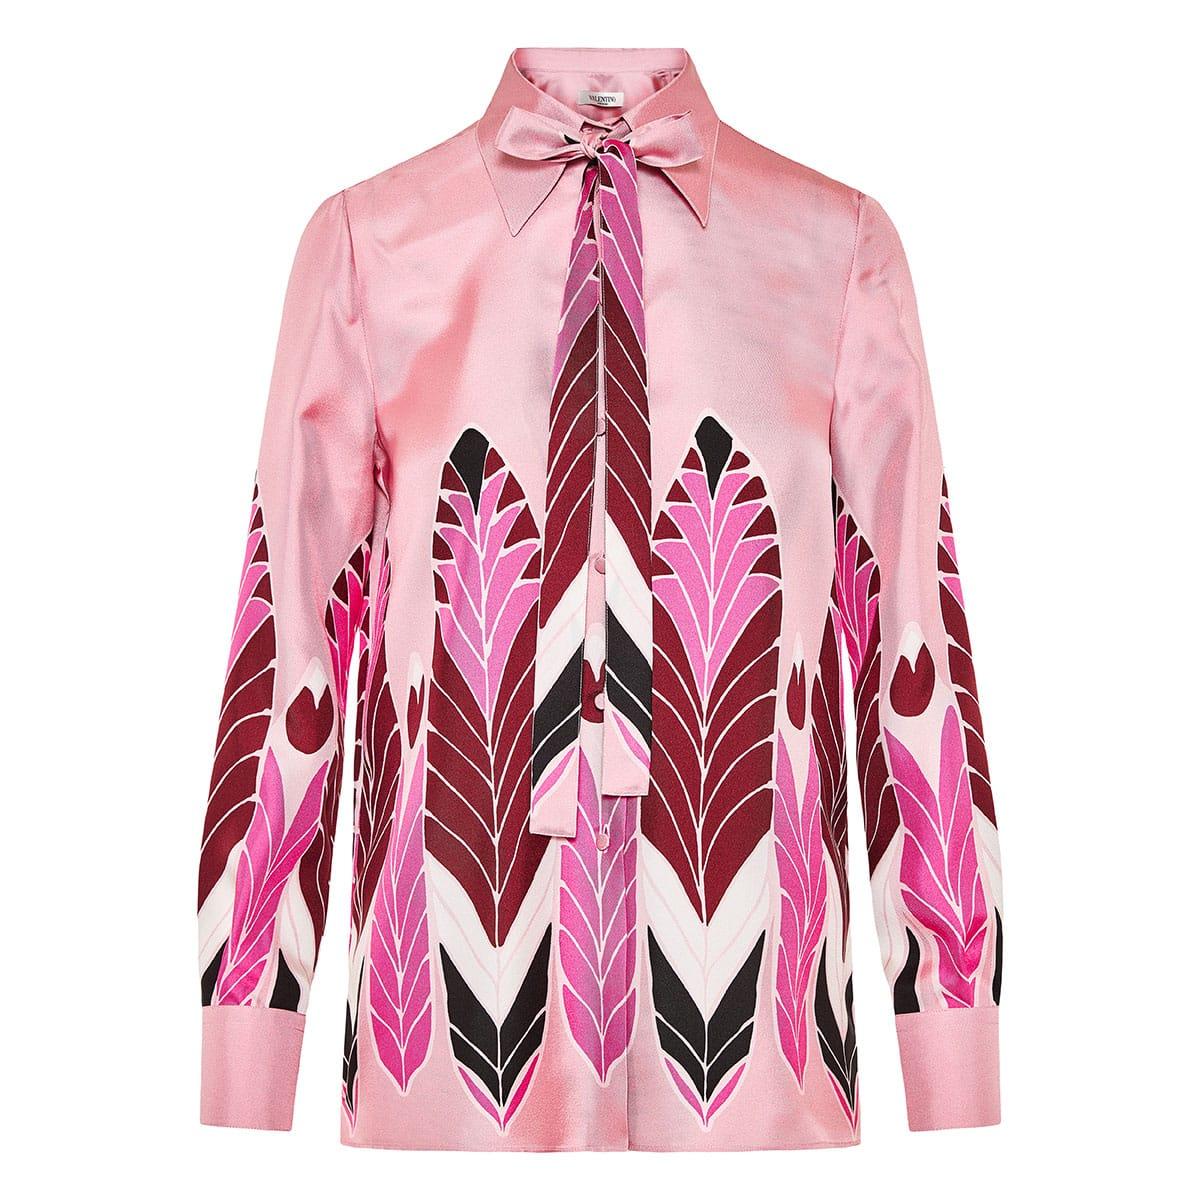 Bow-tie printed twill shirt